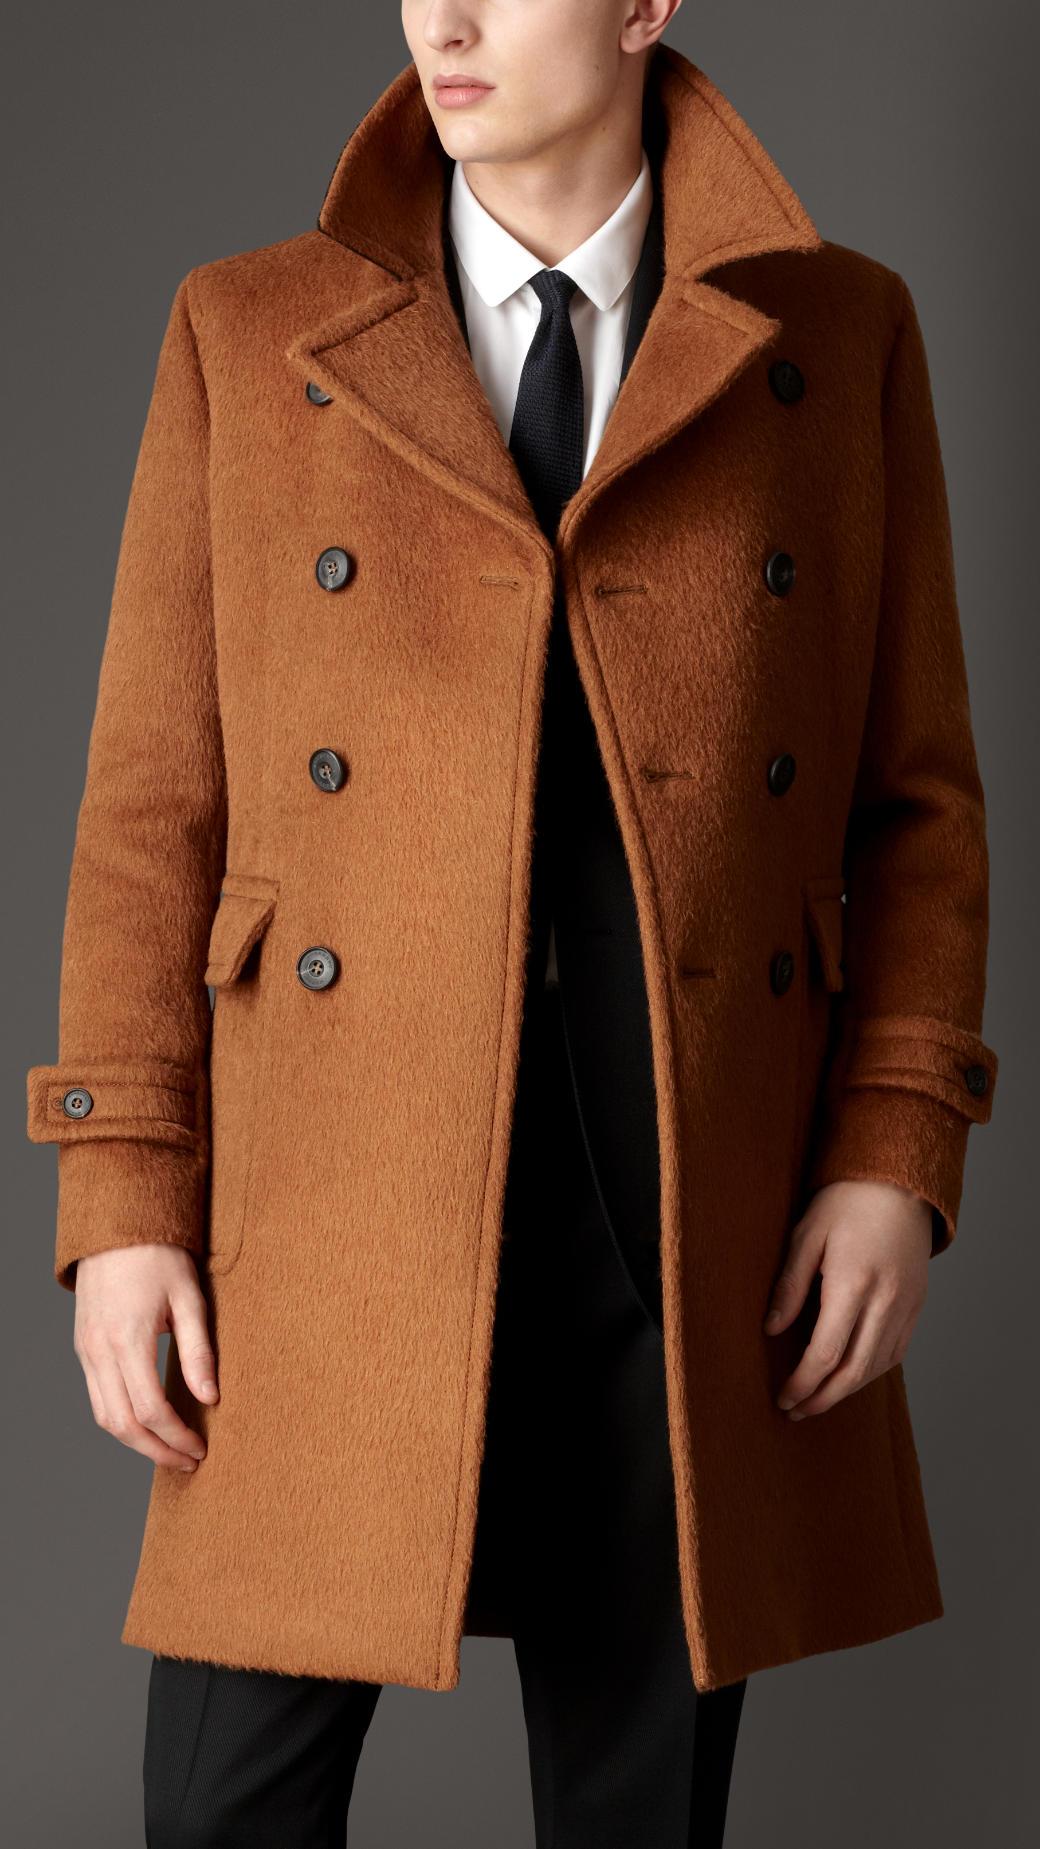 Burberry Doublebreasted Virgin Wool Alpaca Coat In Brown For Men Lyst